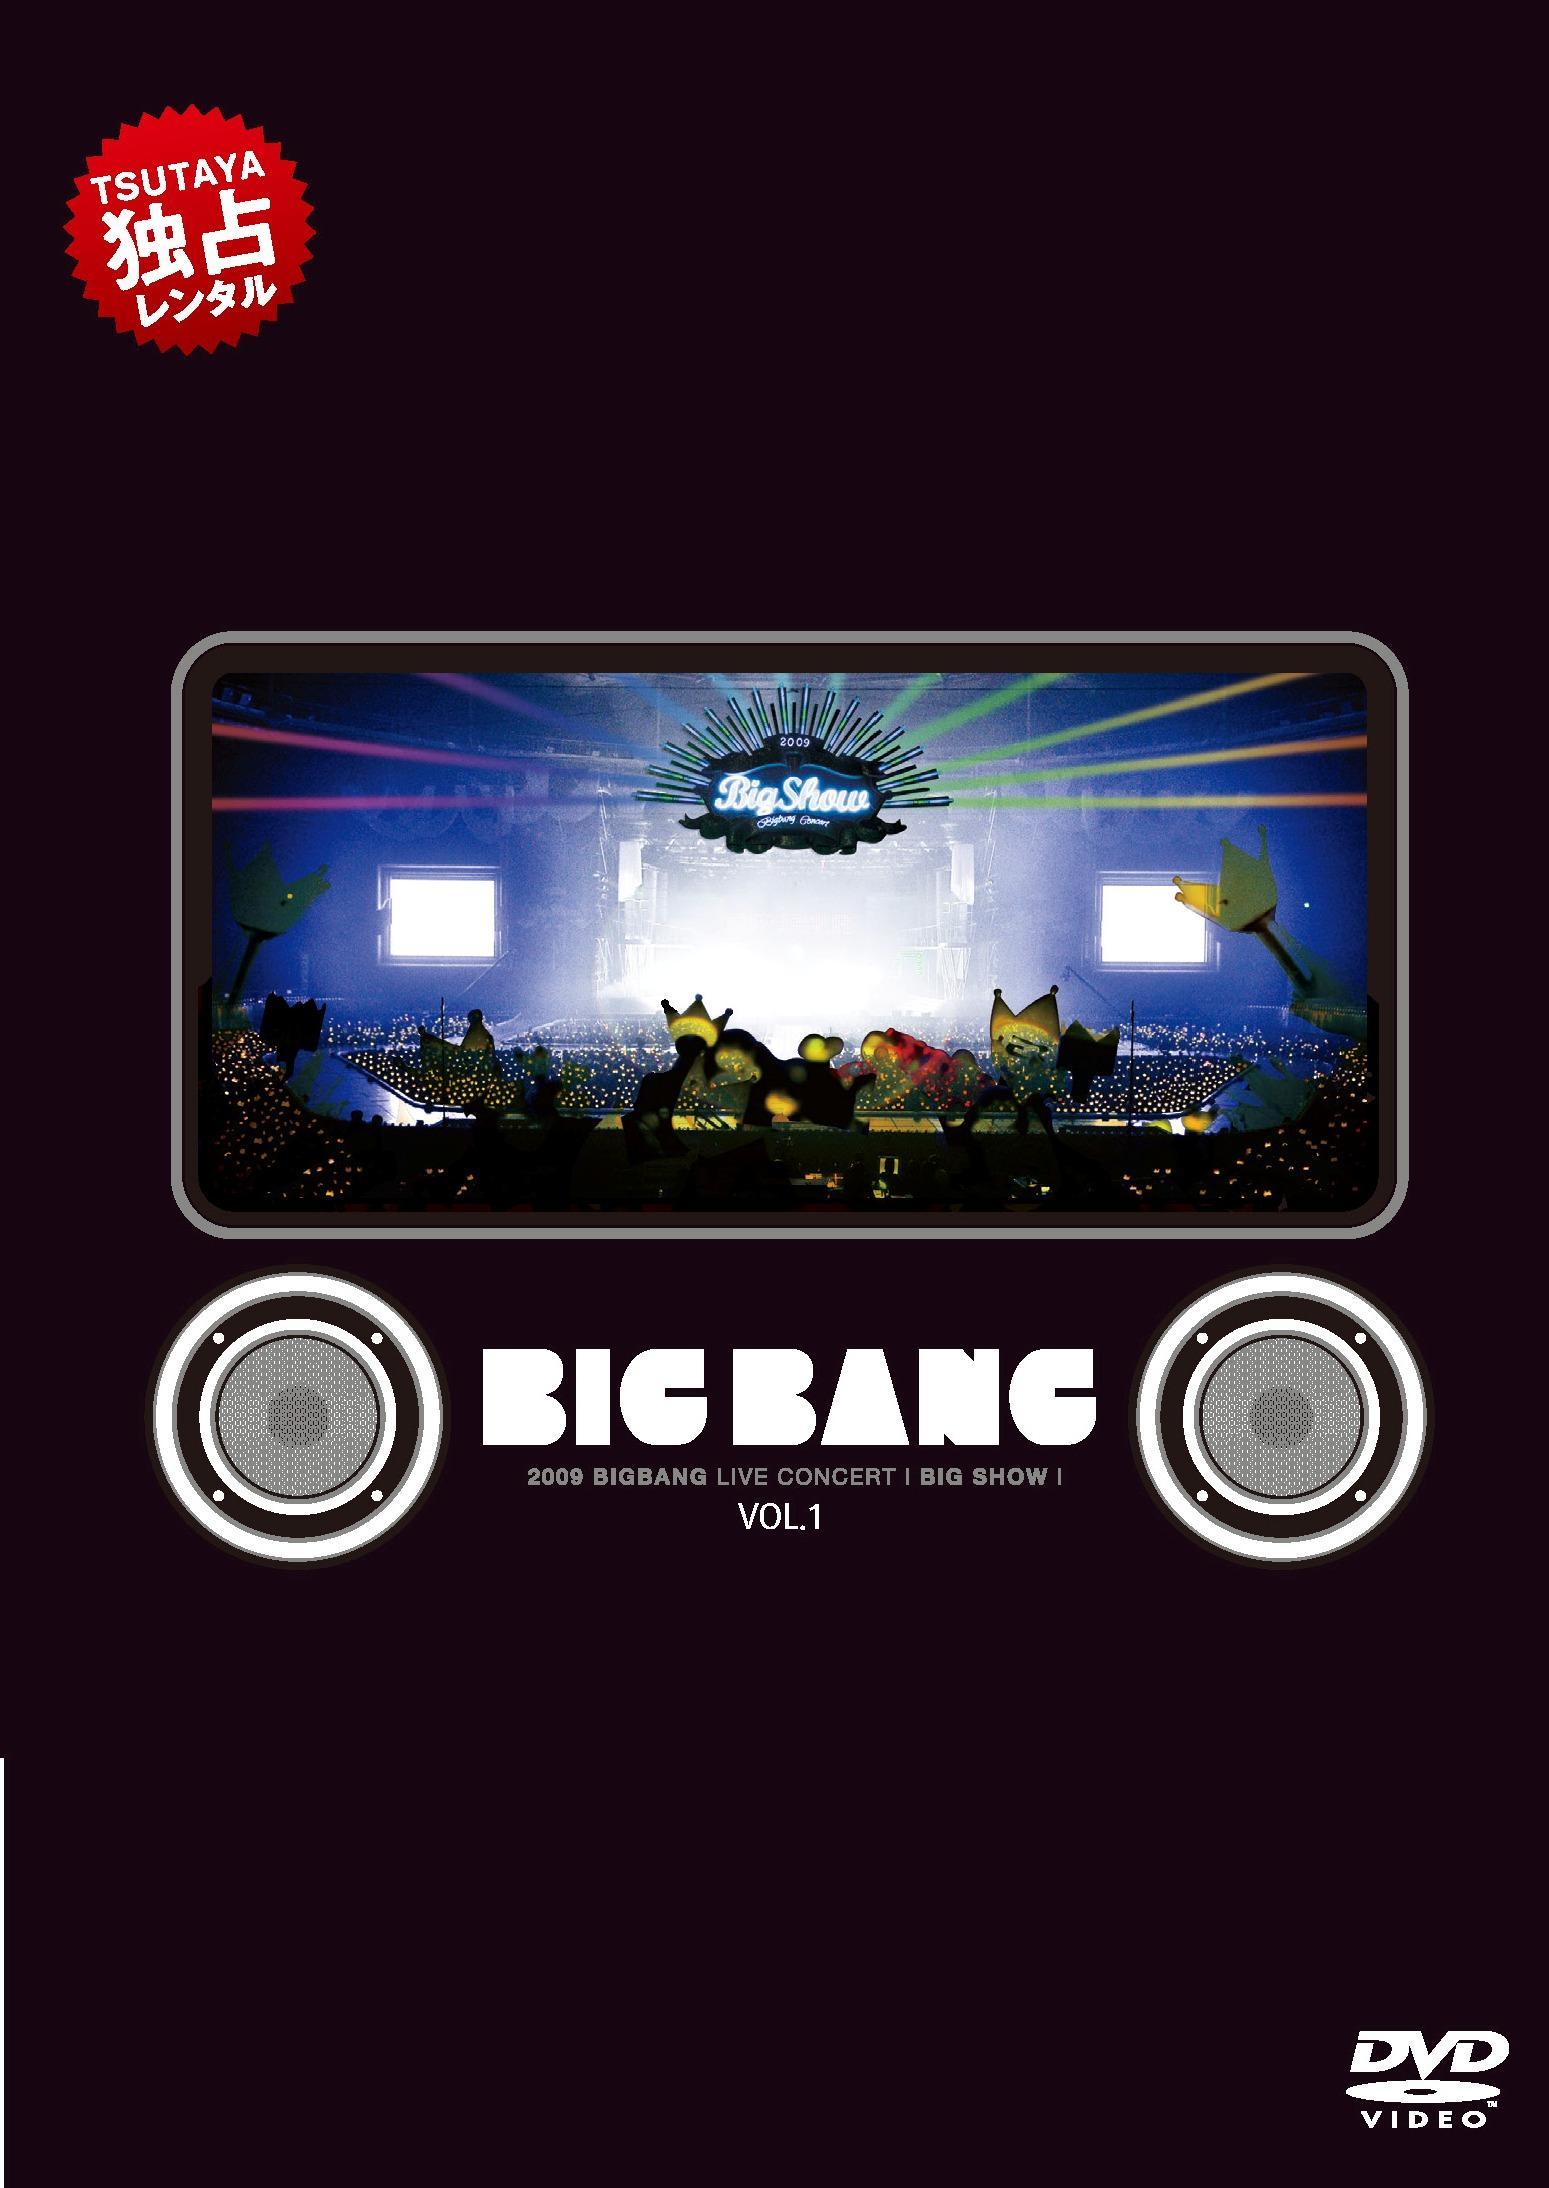 BIGBANG Live Concert 2009 BIG SHOW 2 のサムネイル画像